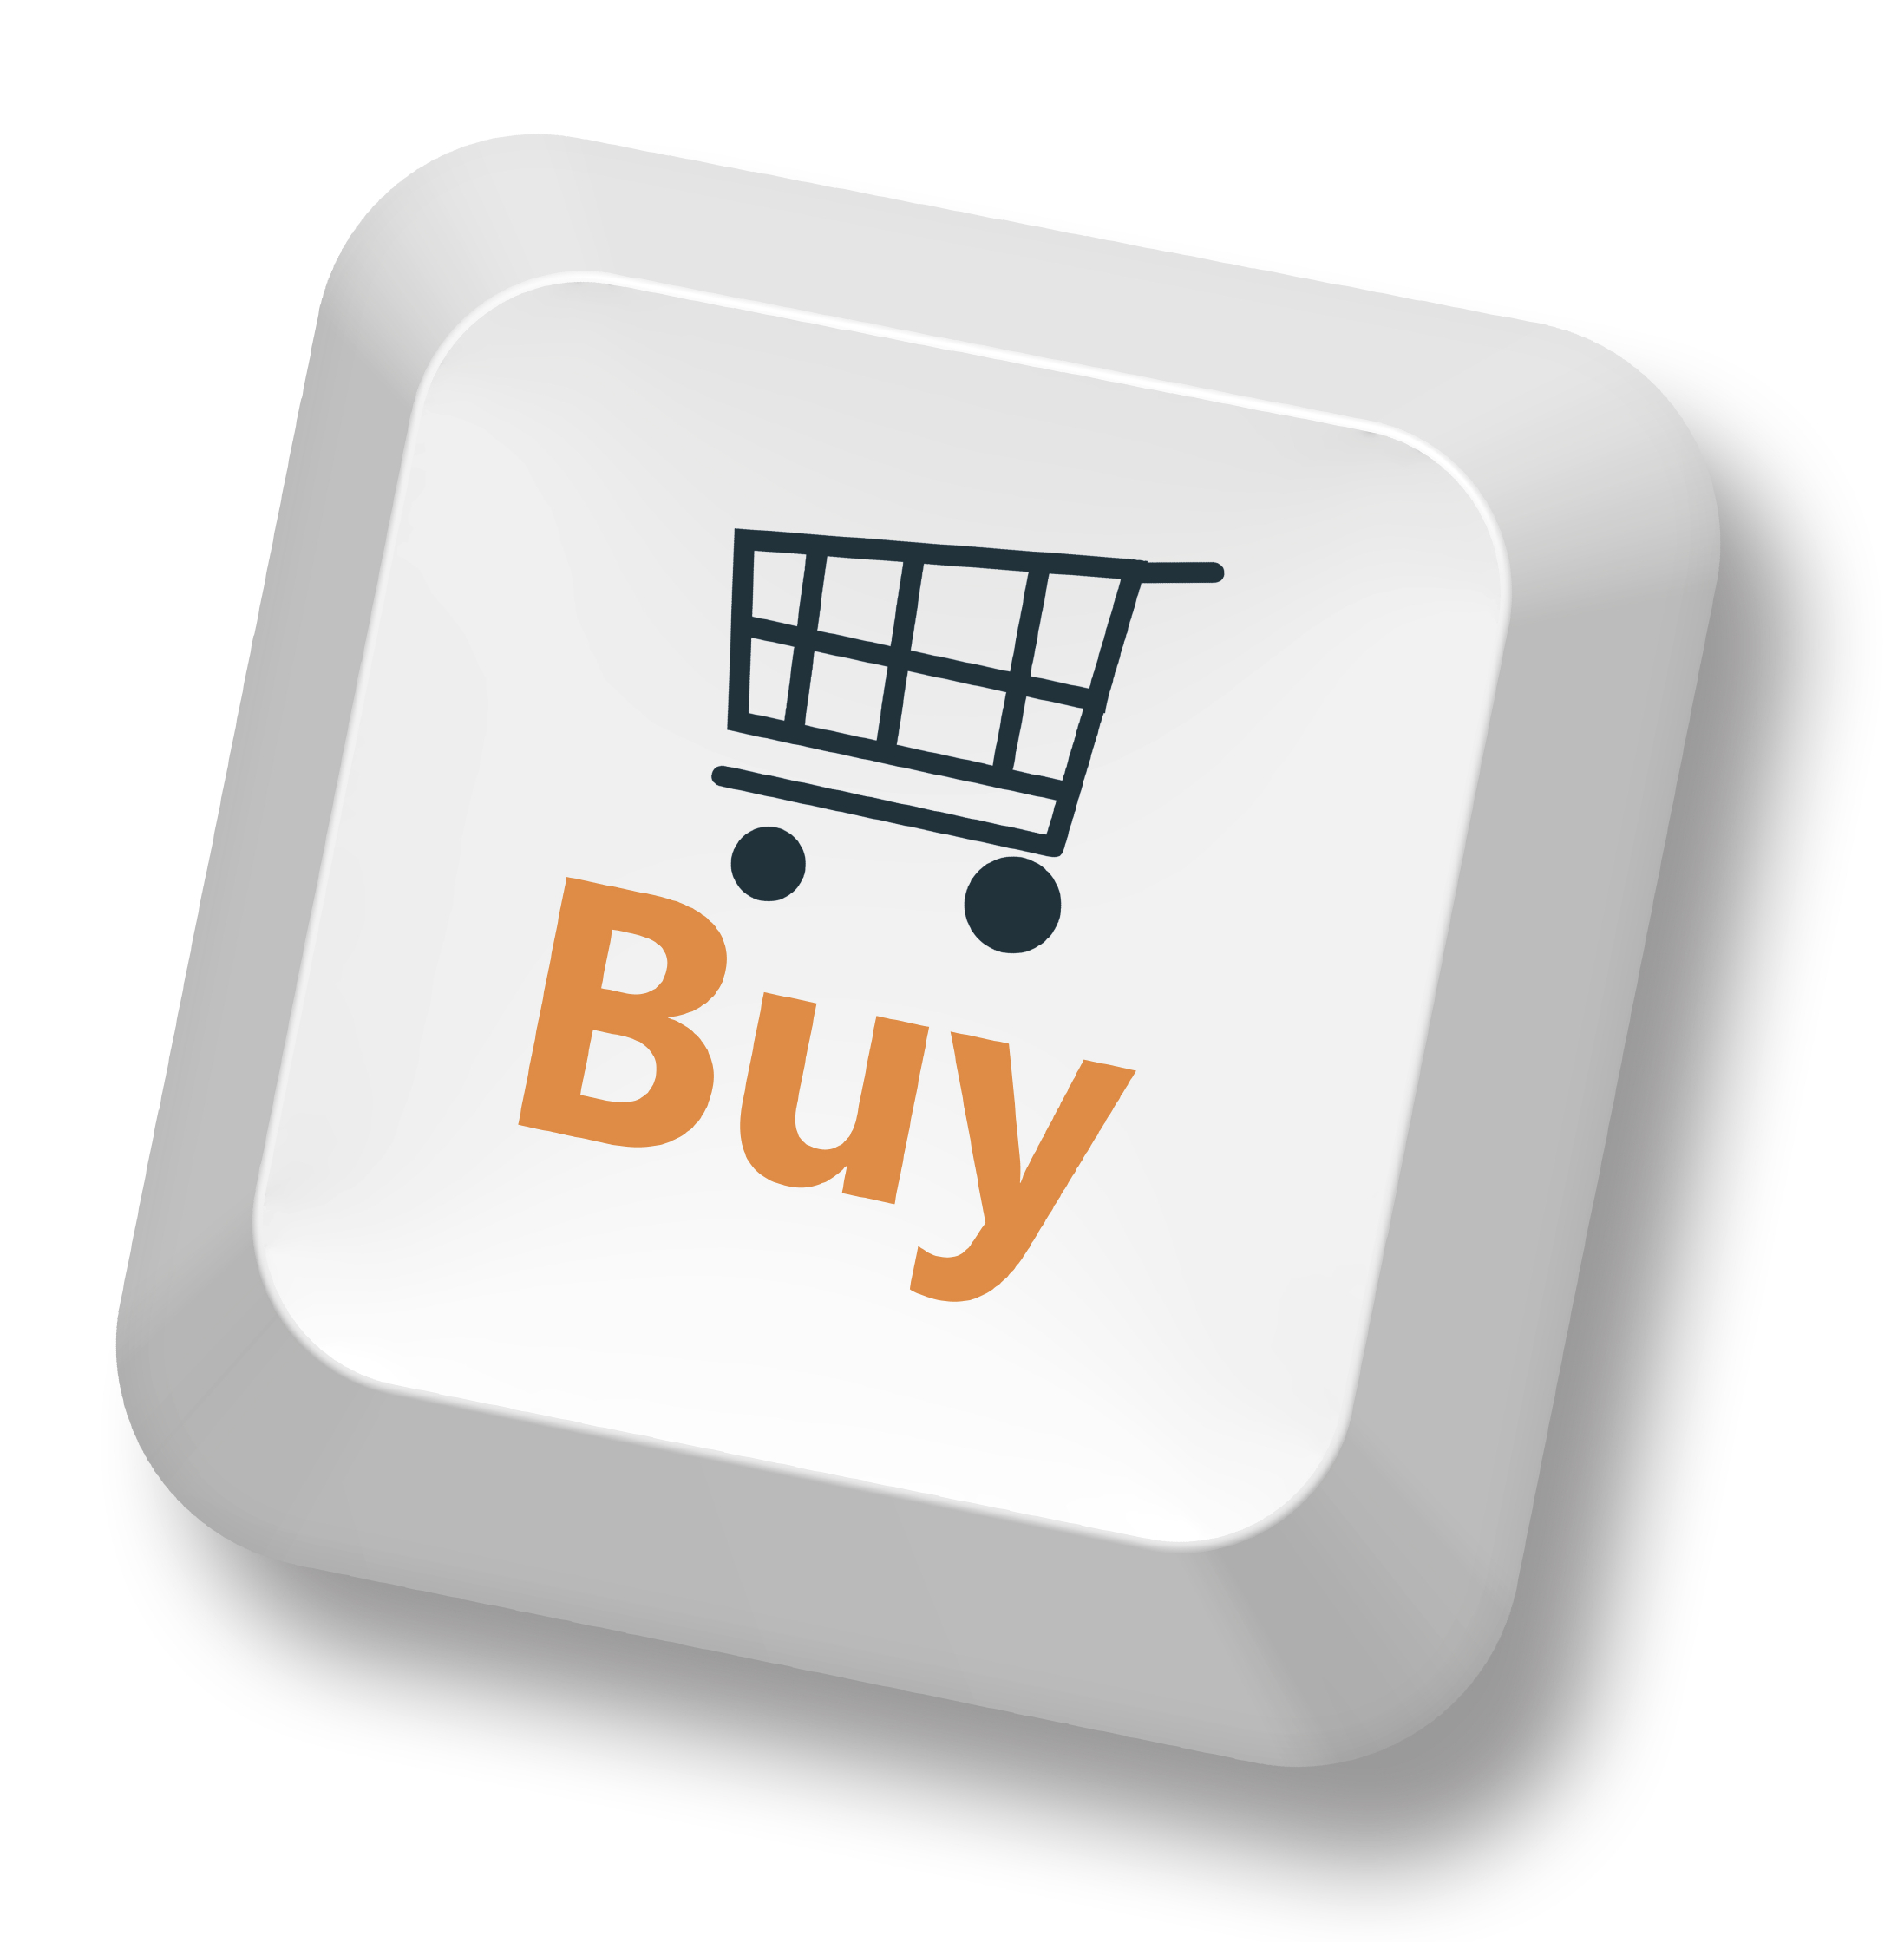 buy-button-8.jpg